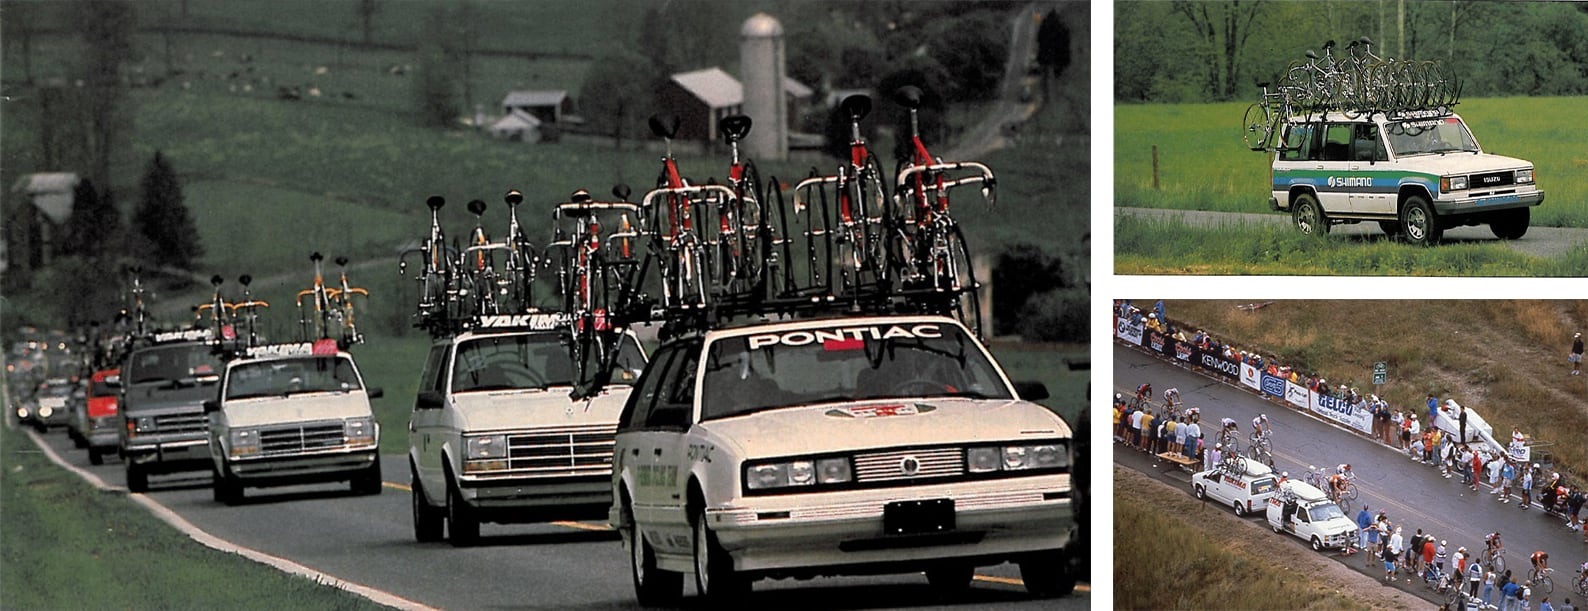 Yakima retro heritage bike racks